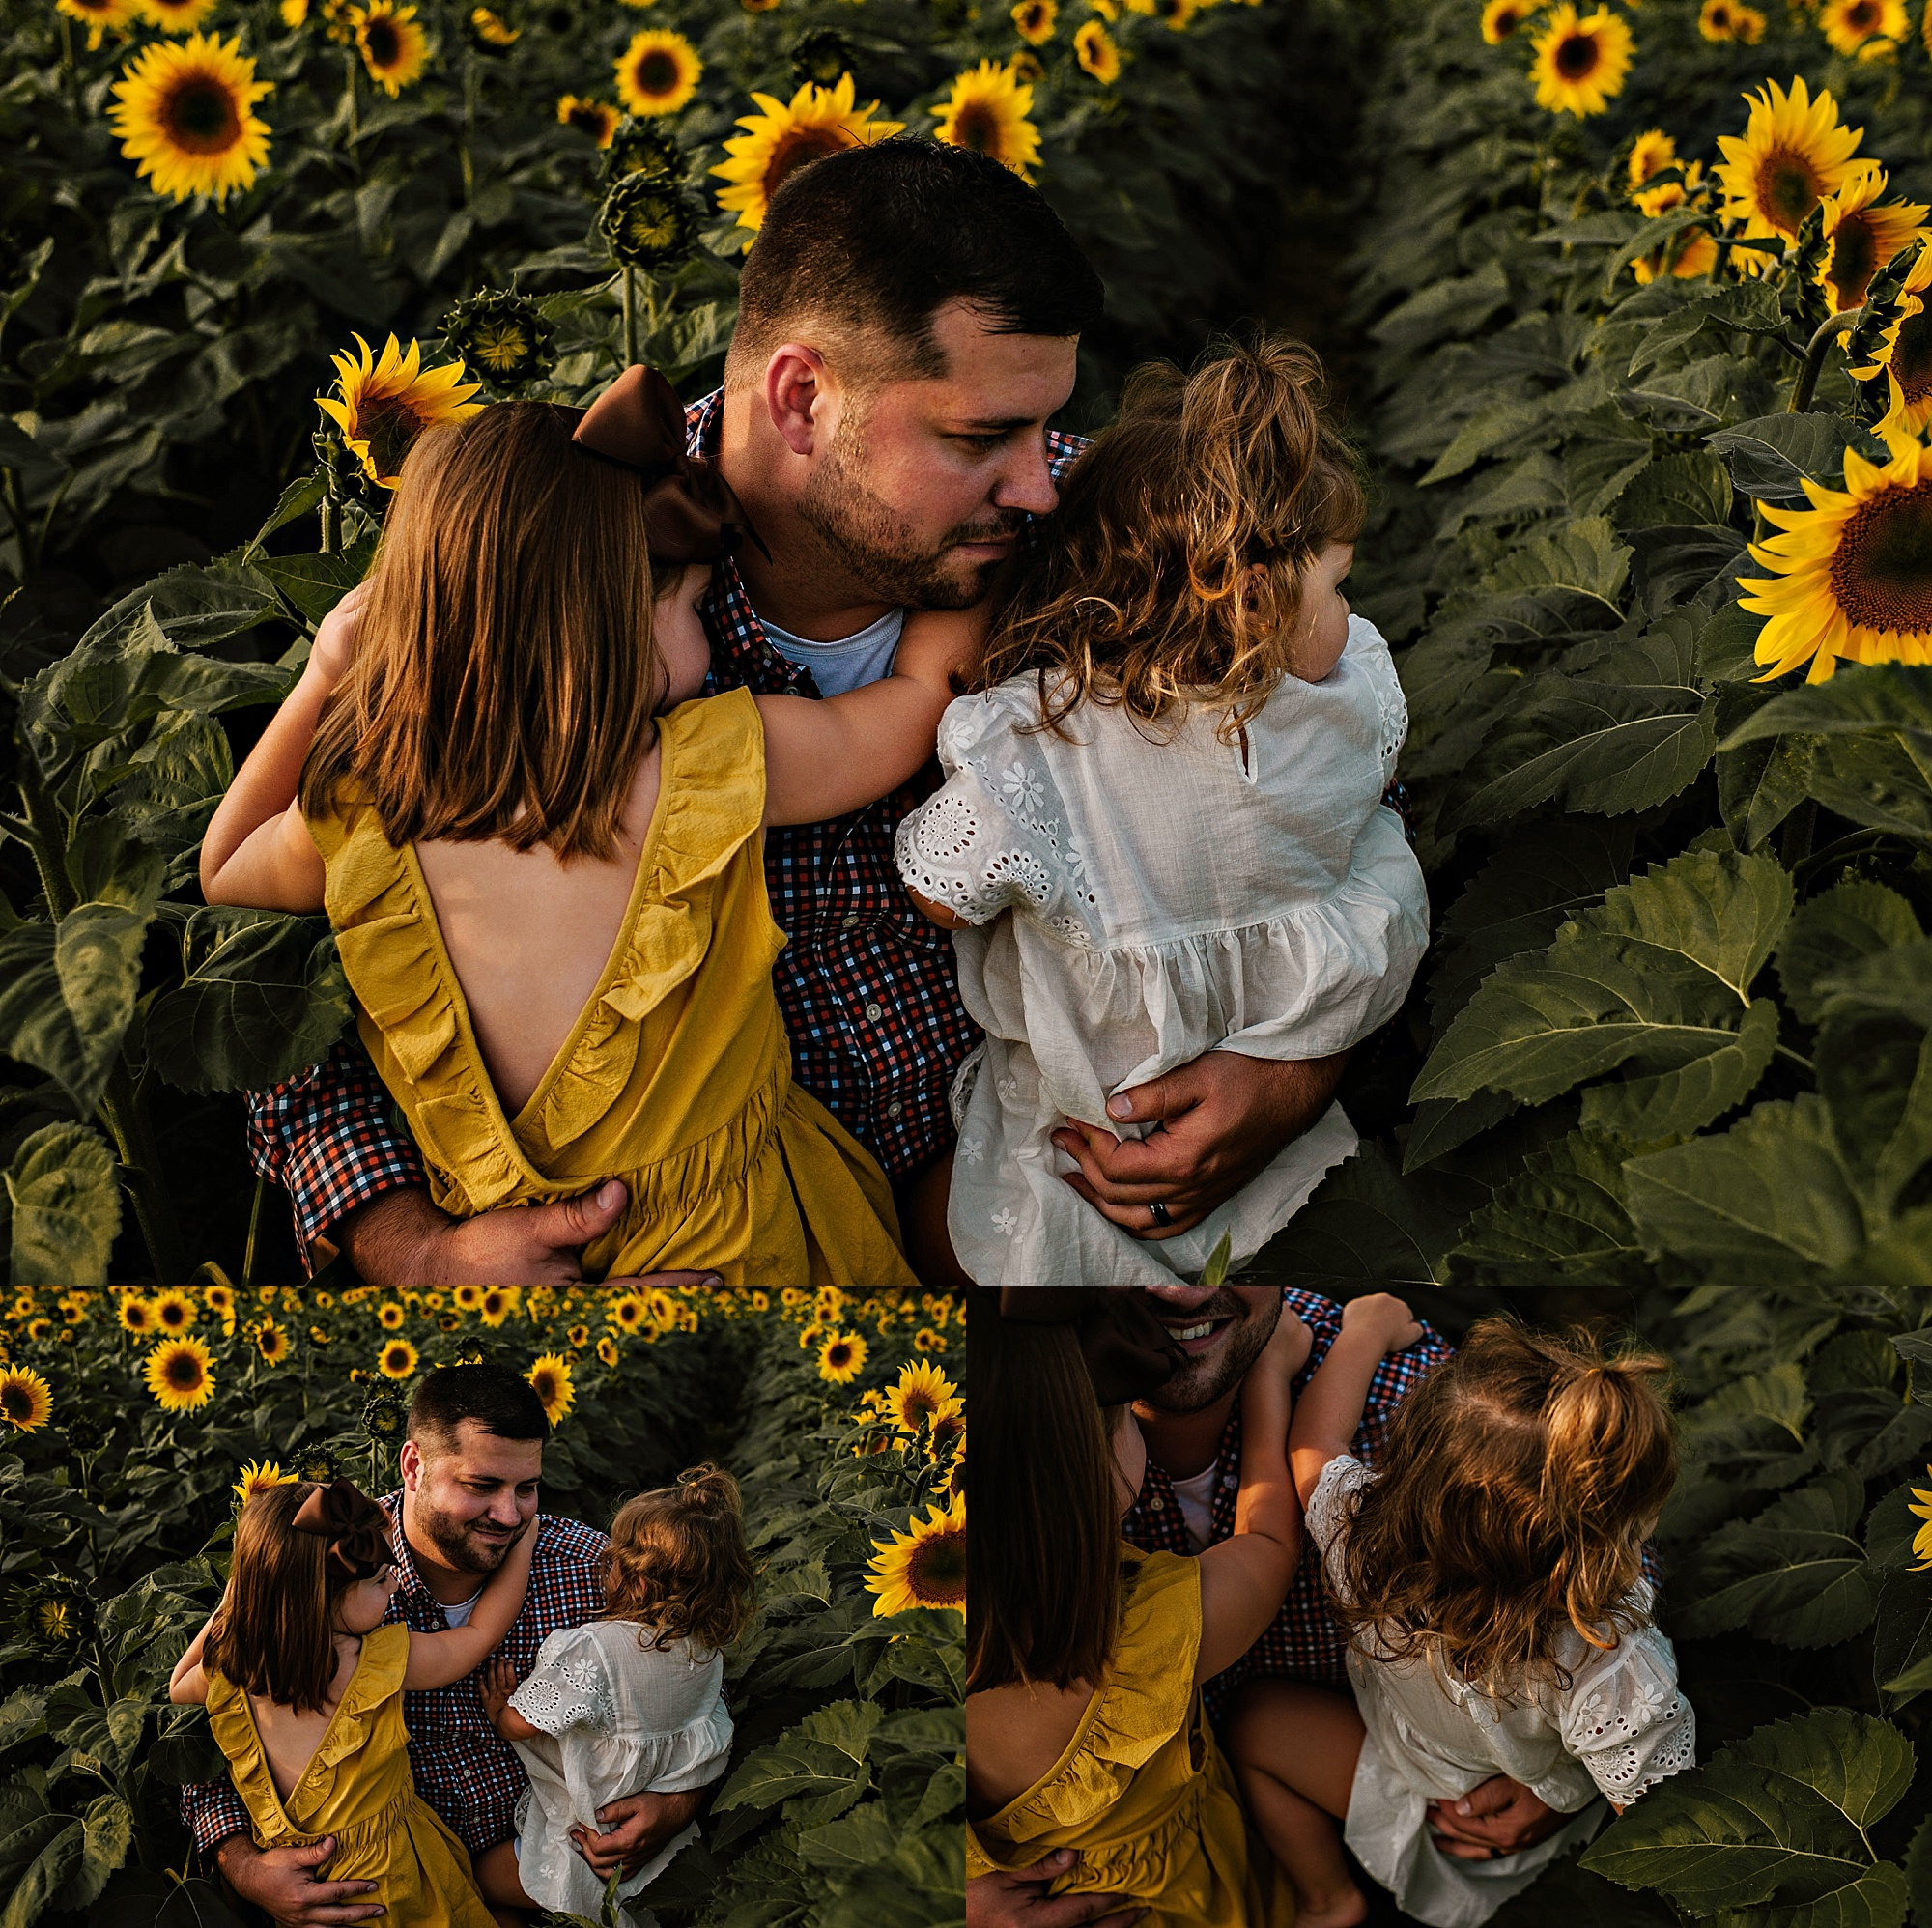 Rutherford-family-cleveland-photographer-lauren-grayson-sunflower-field-session_0022.jpg